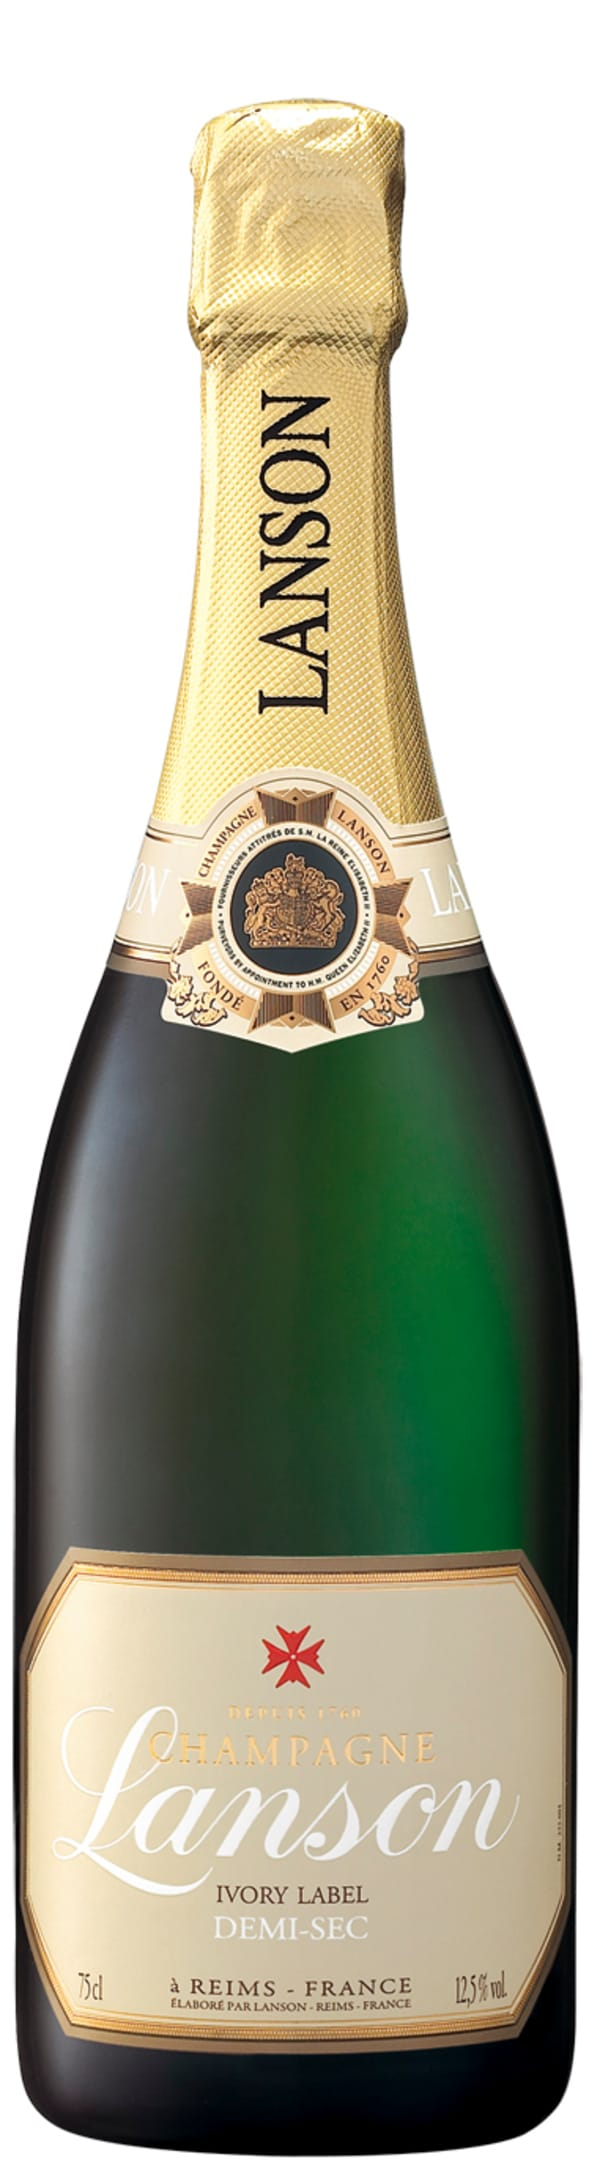 Lanson Ivory Label Champagne Demi-Sec